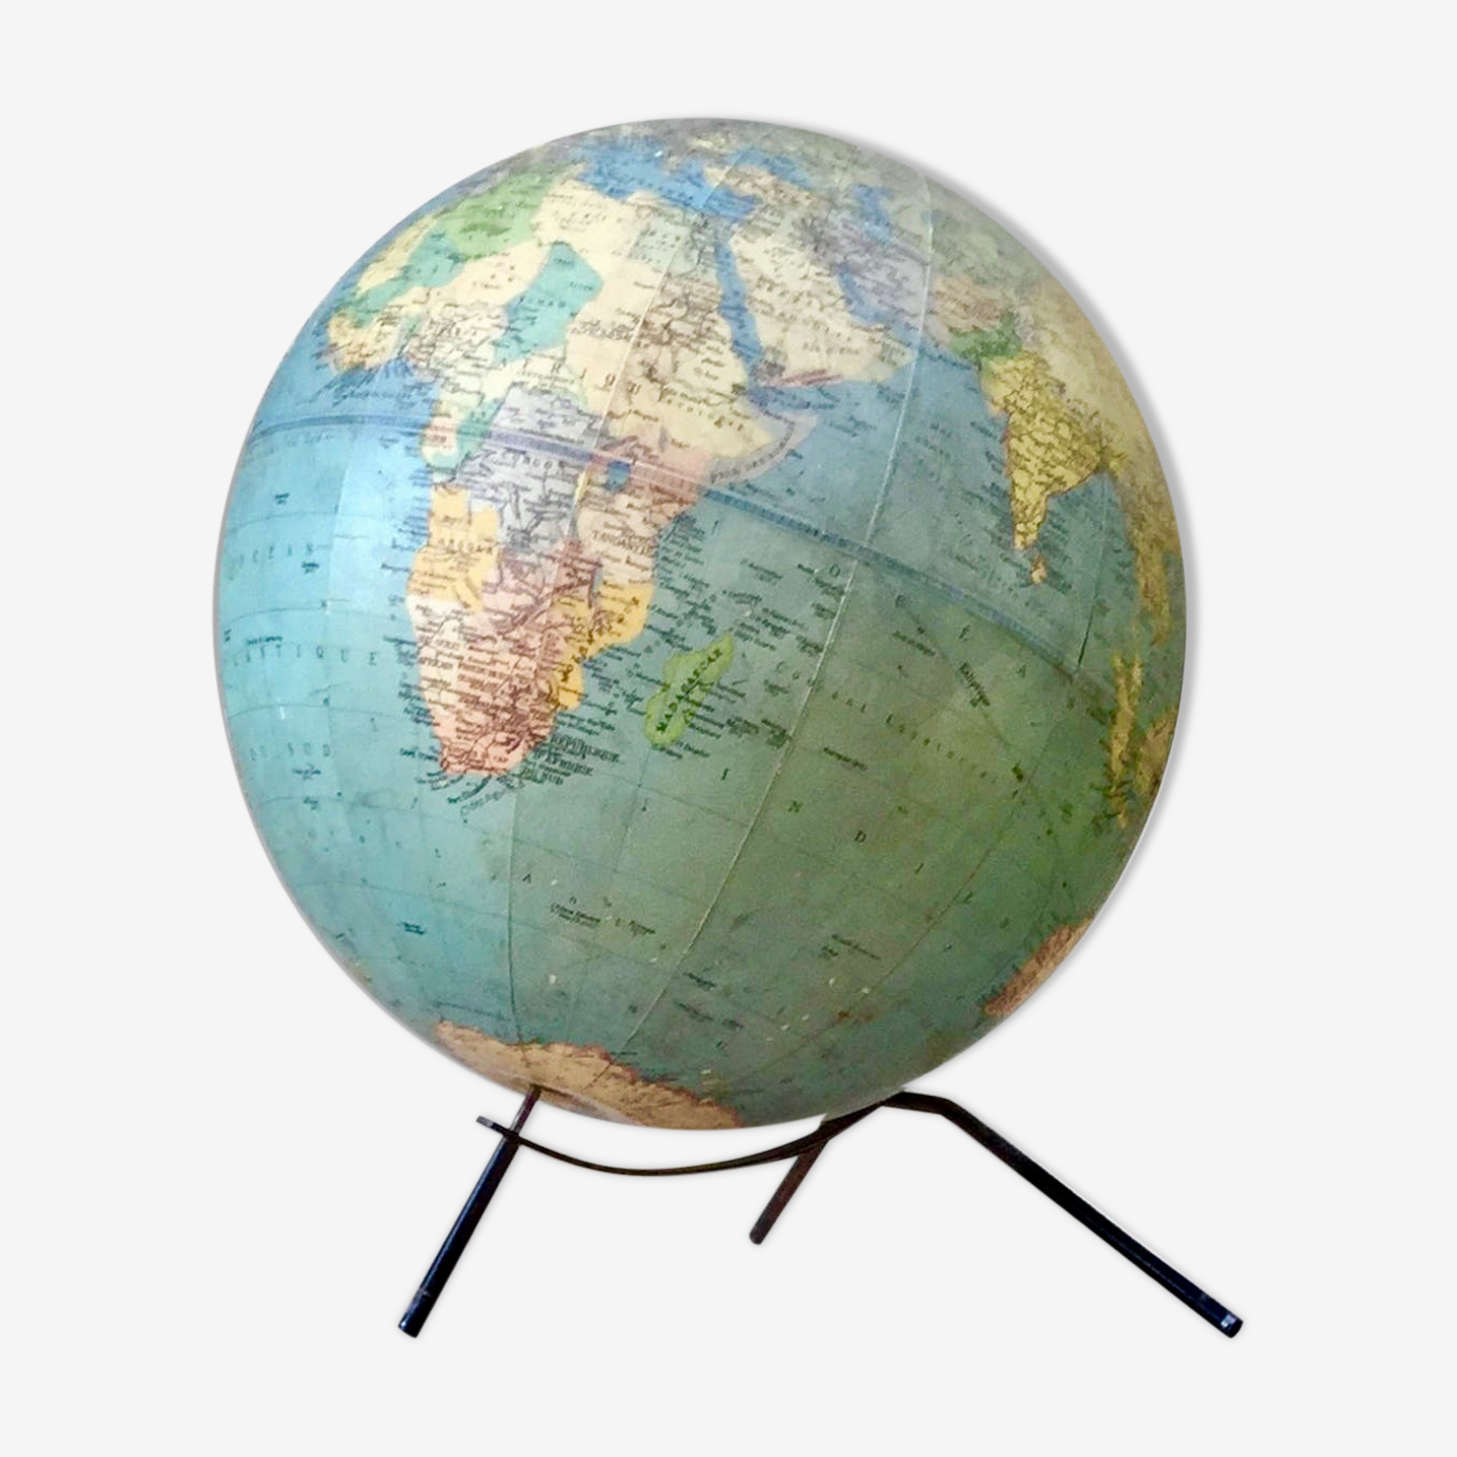 Large world map Taride base steel